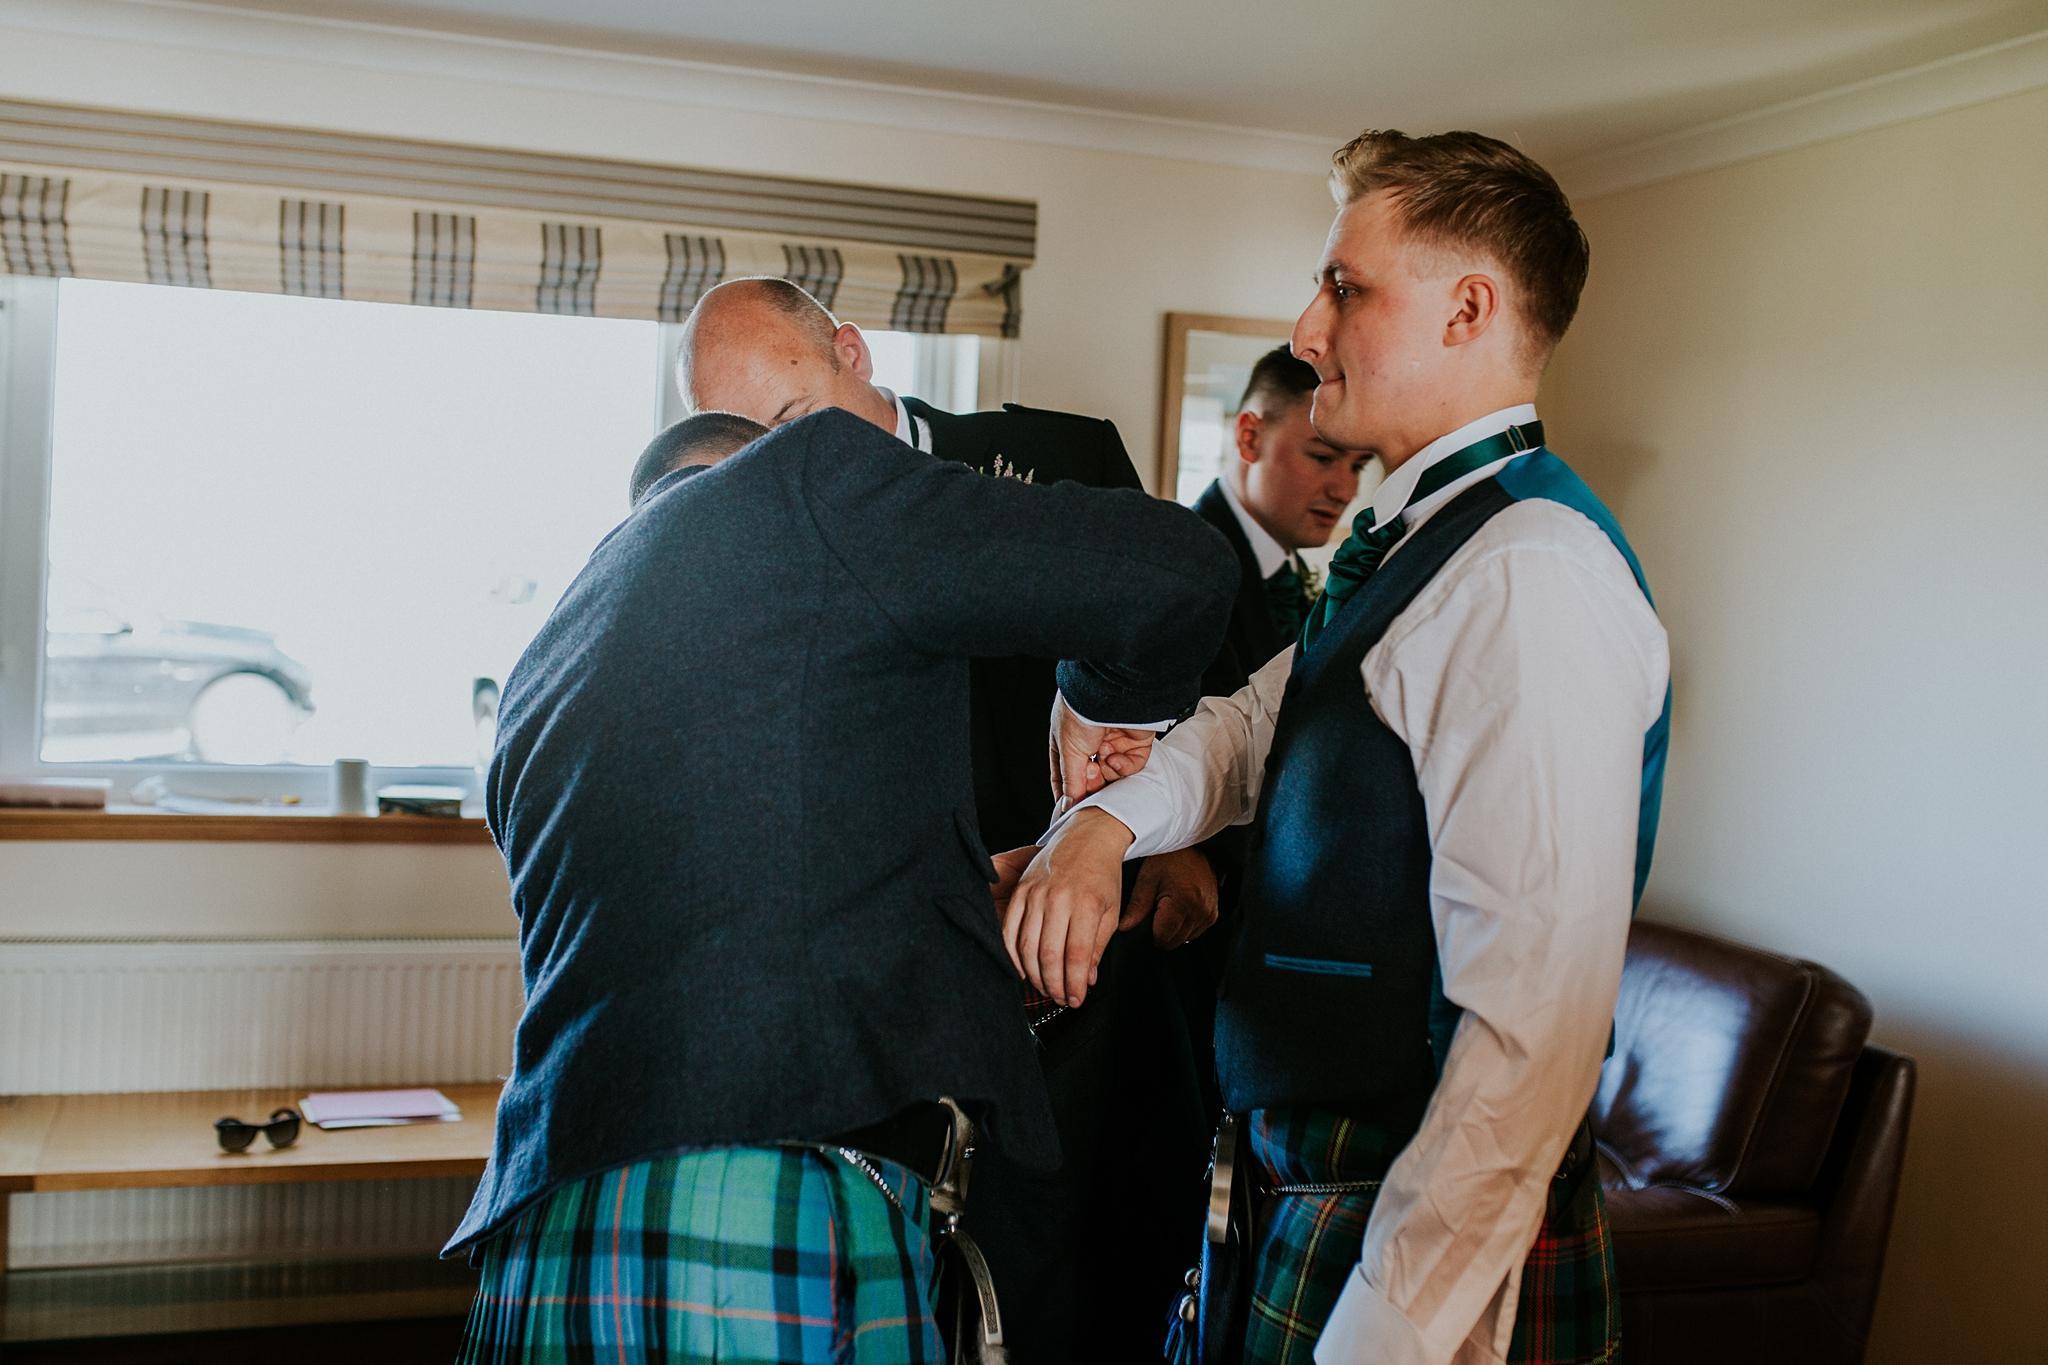 Linda&Shockie_northuist_wedding_photographer-4.JPG